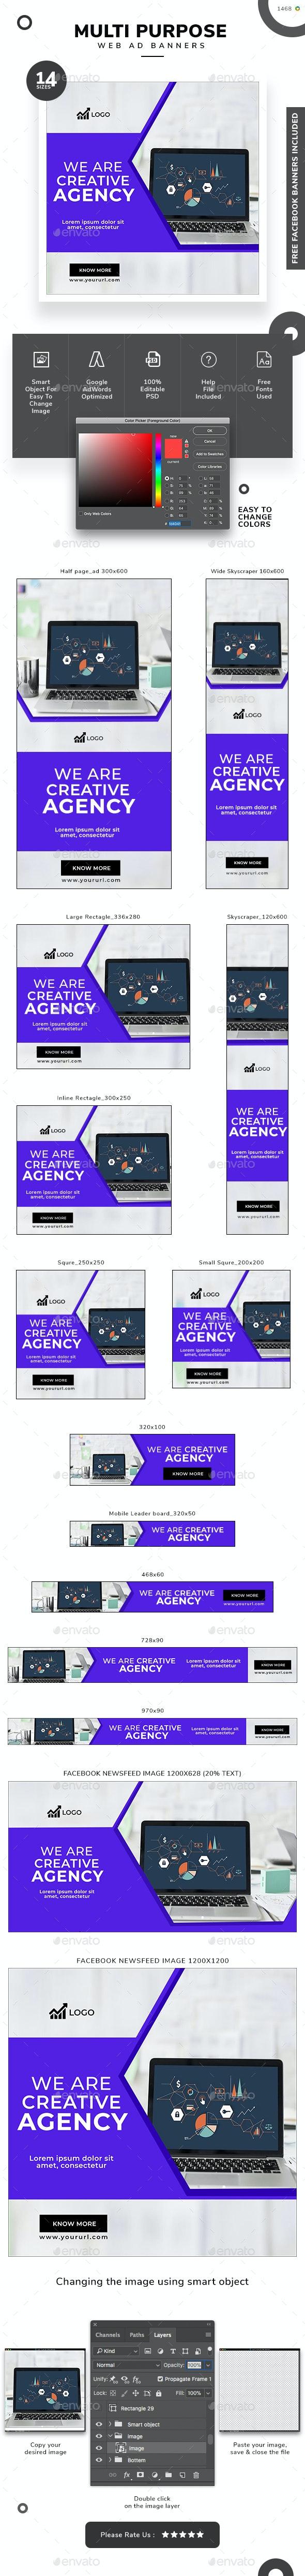 Multi Purpose Web Banner Set - Banners & Ads Web Elements